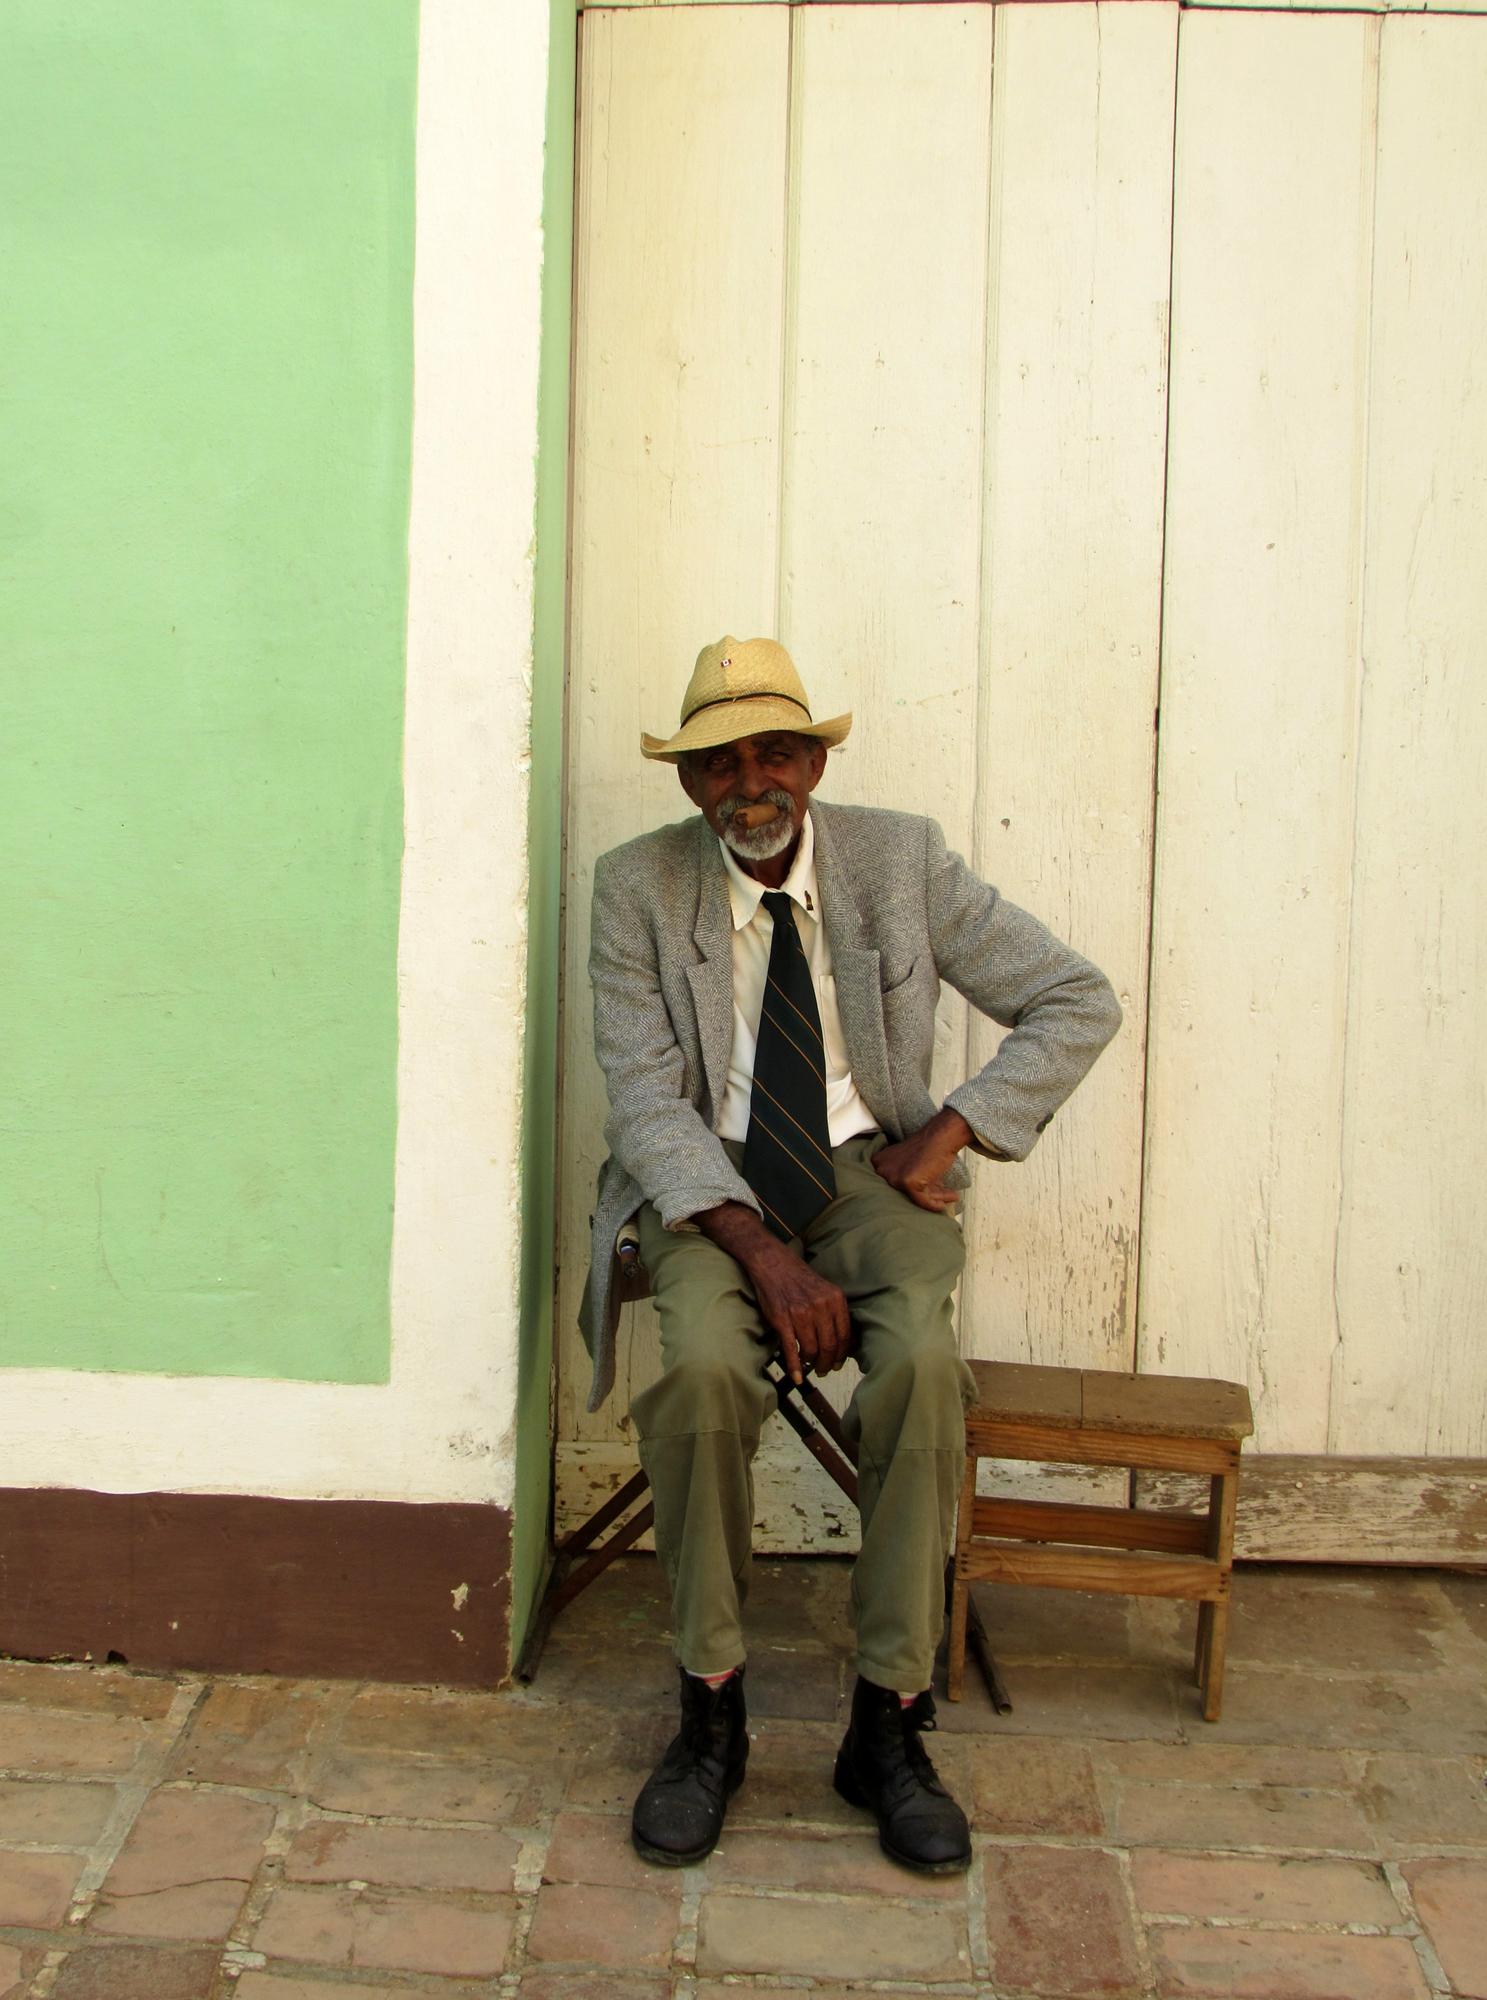 A kind local smoking his cigar